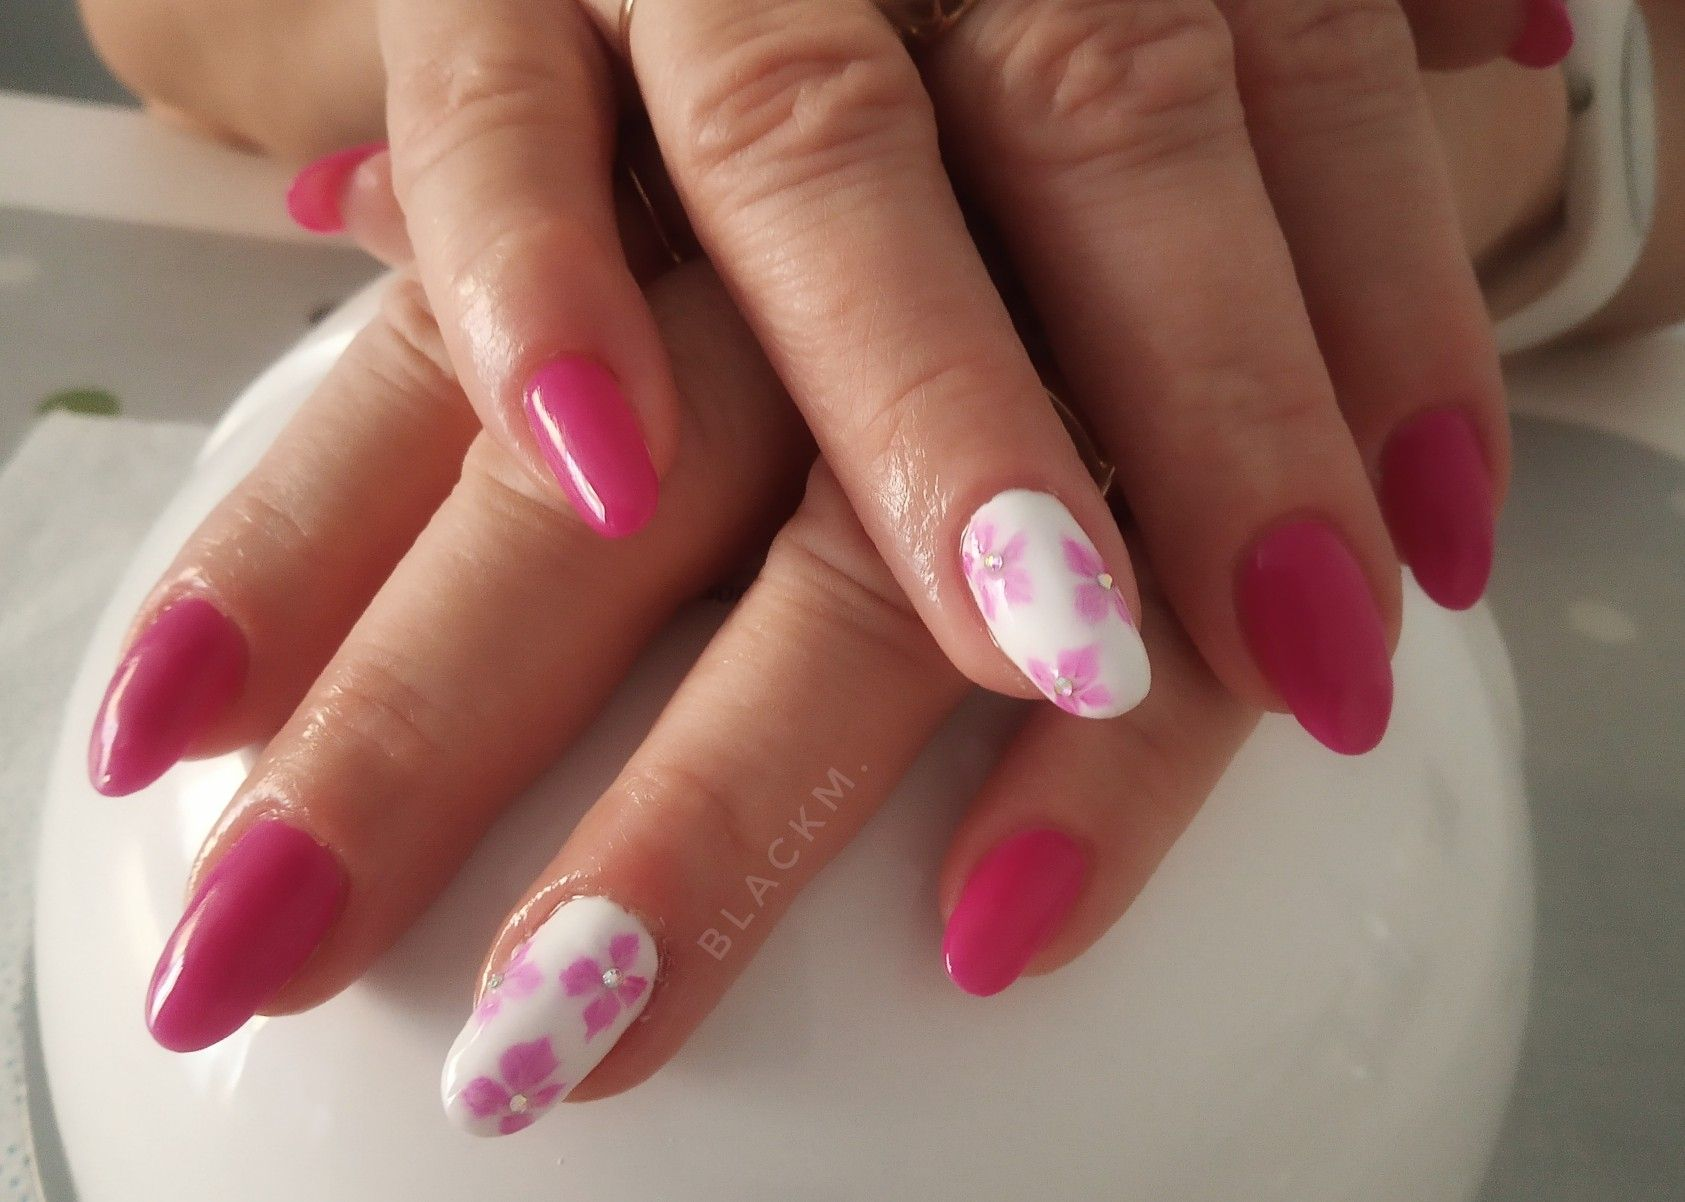 Pin on Őszi körmök (Autumn Nails)